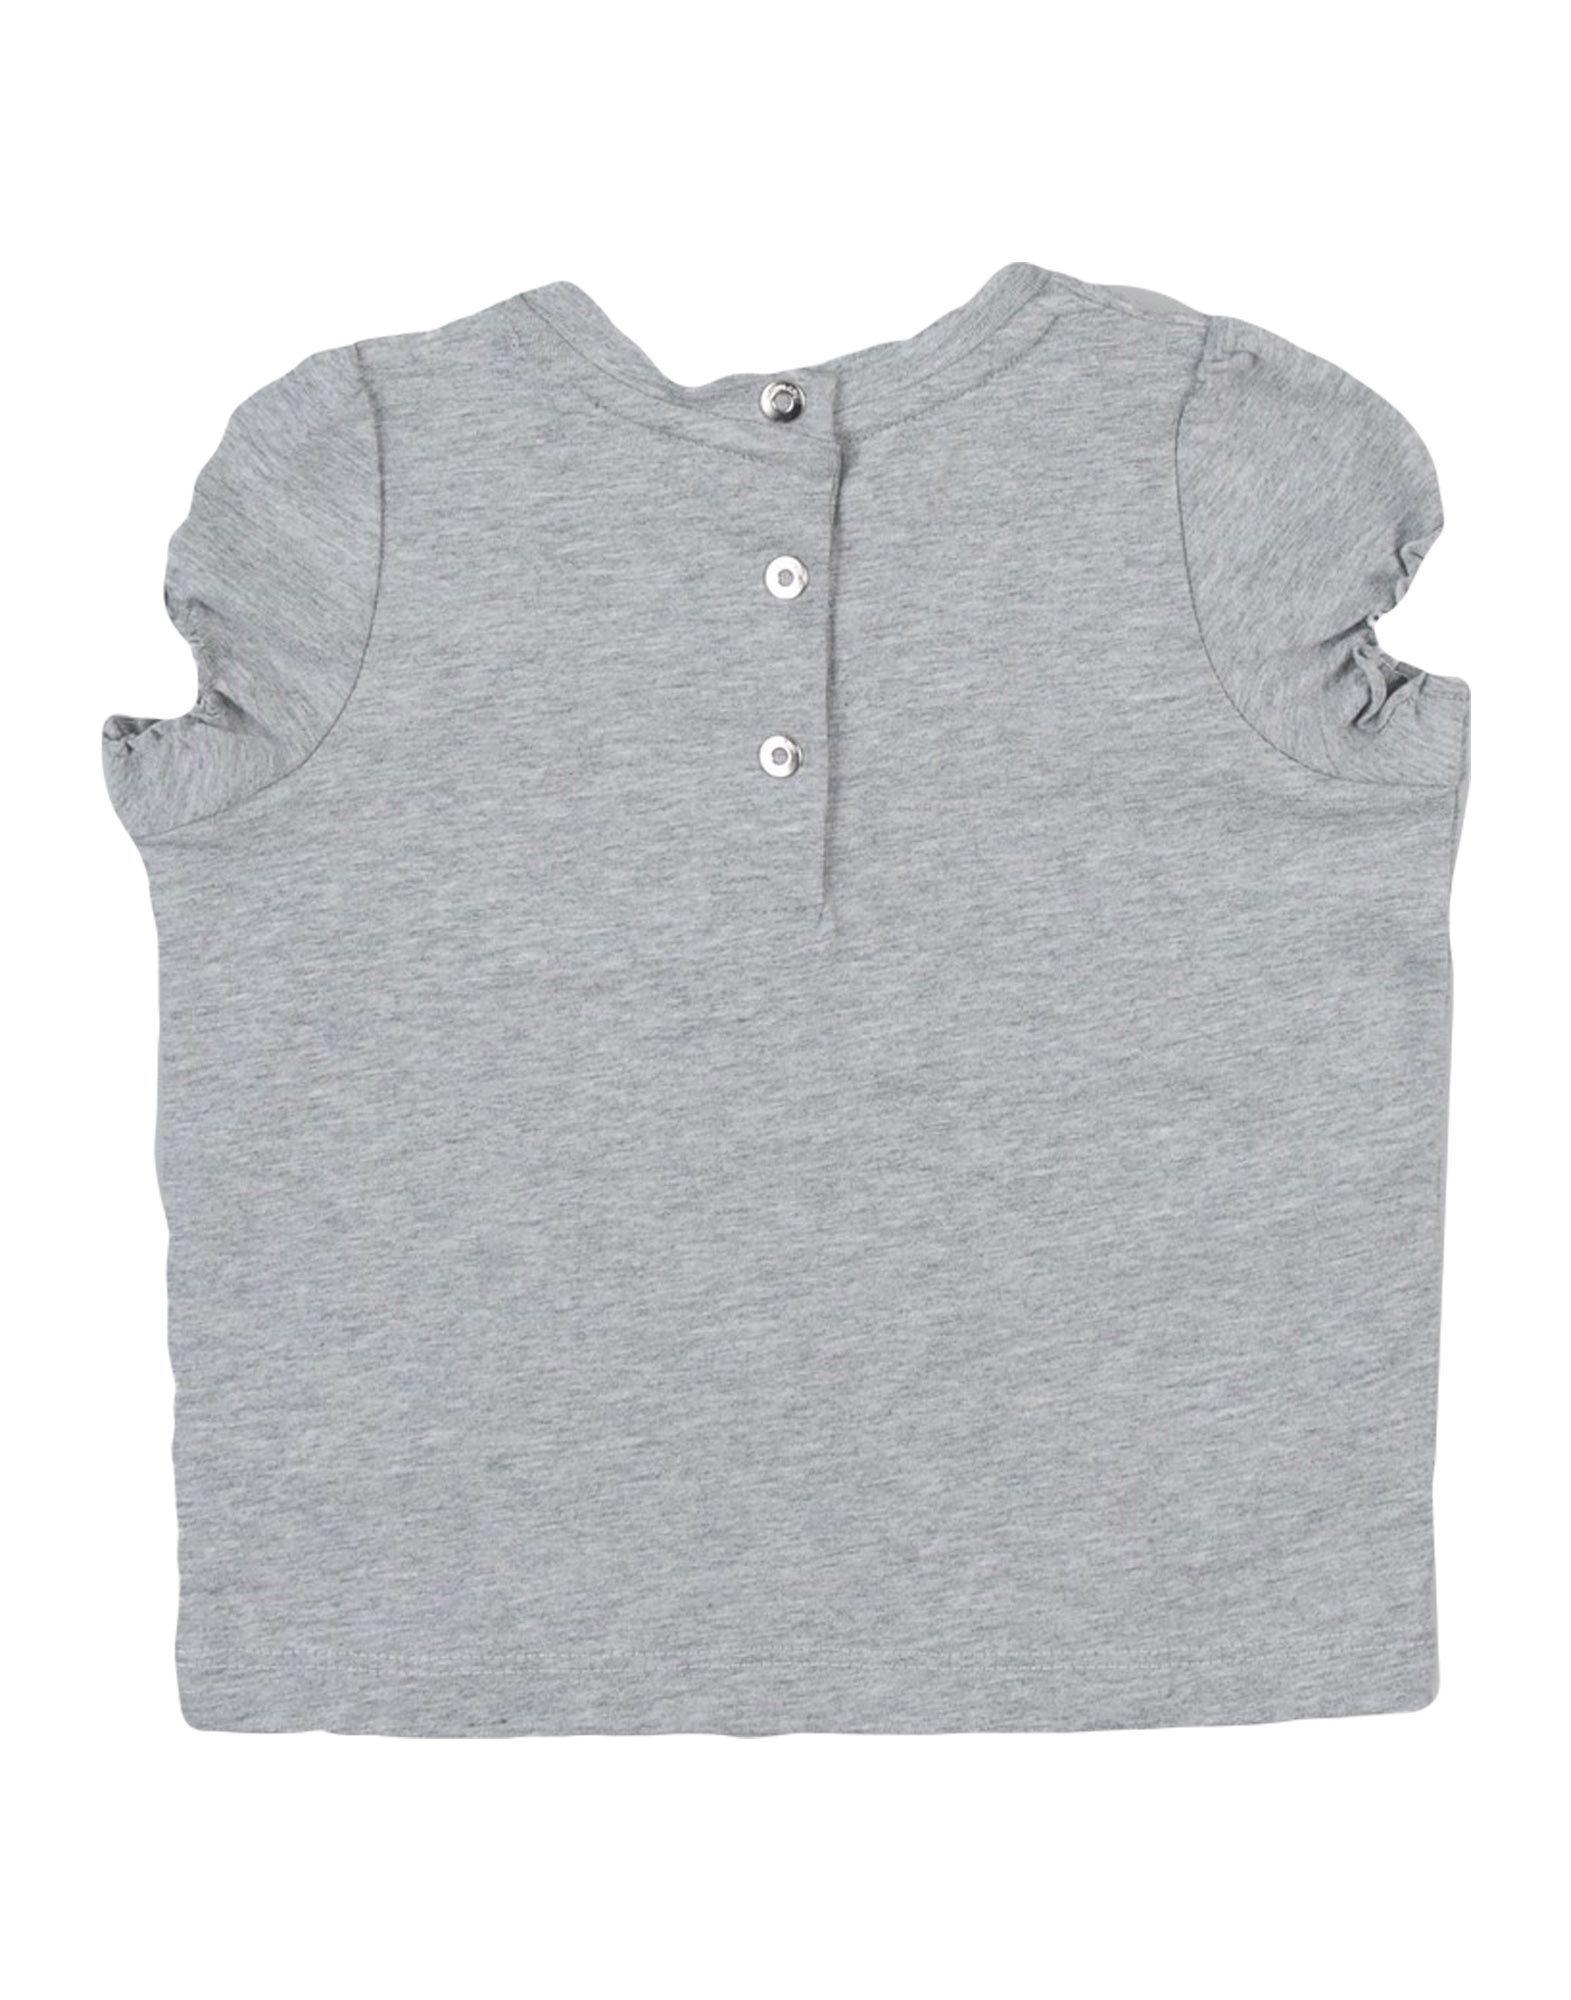 Roberto Cavalli Junior Grey Cotton T-shirt